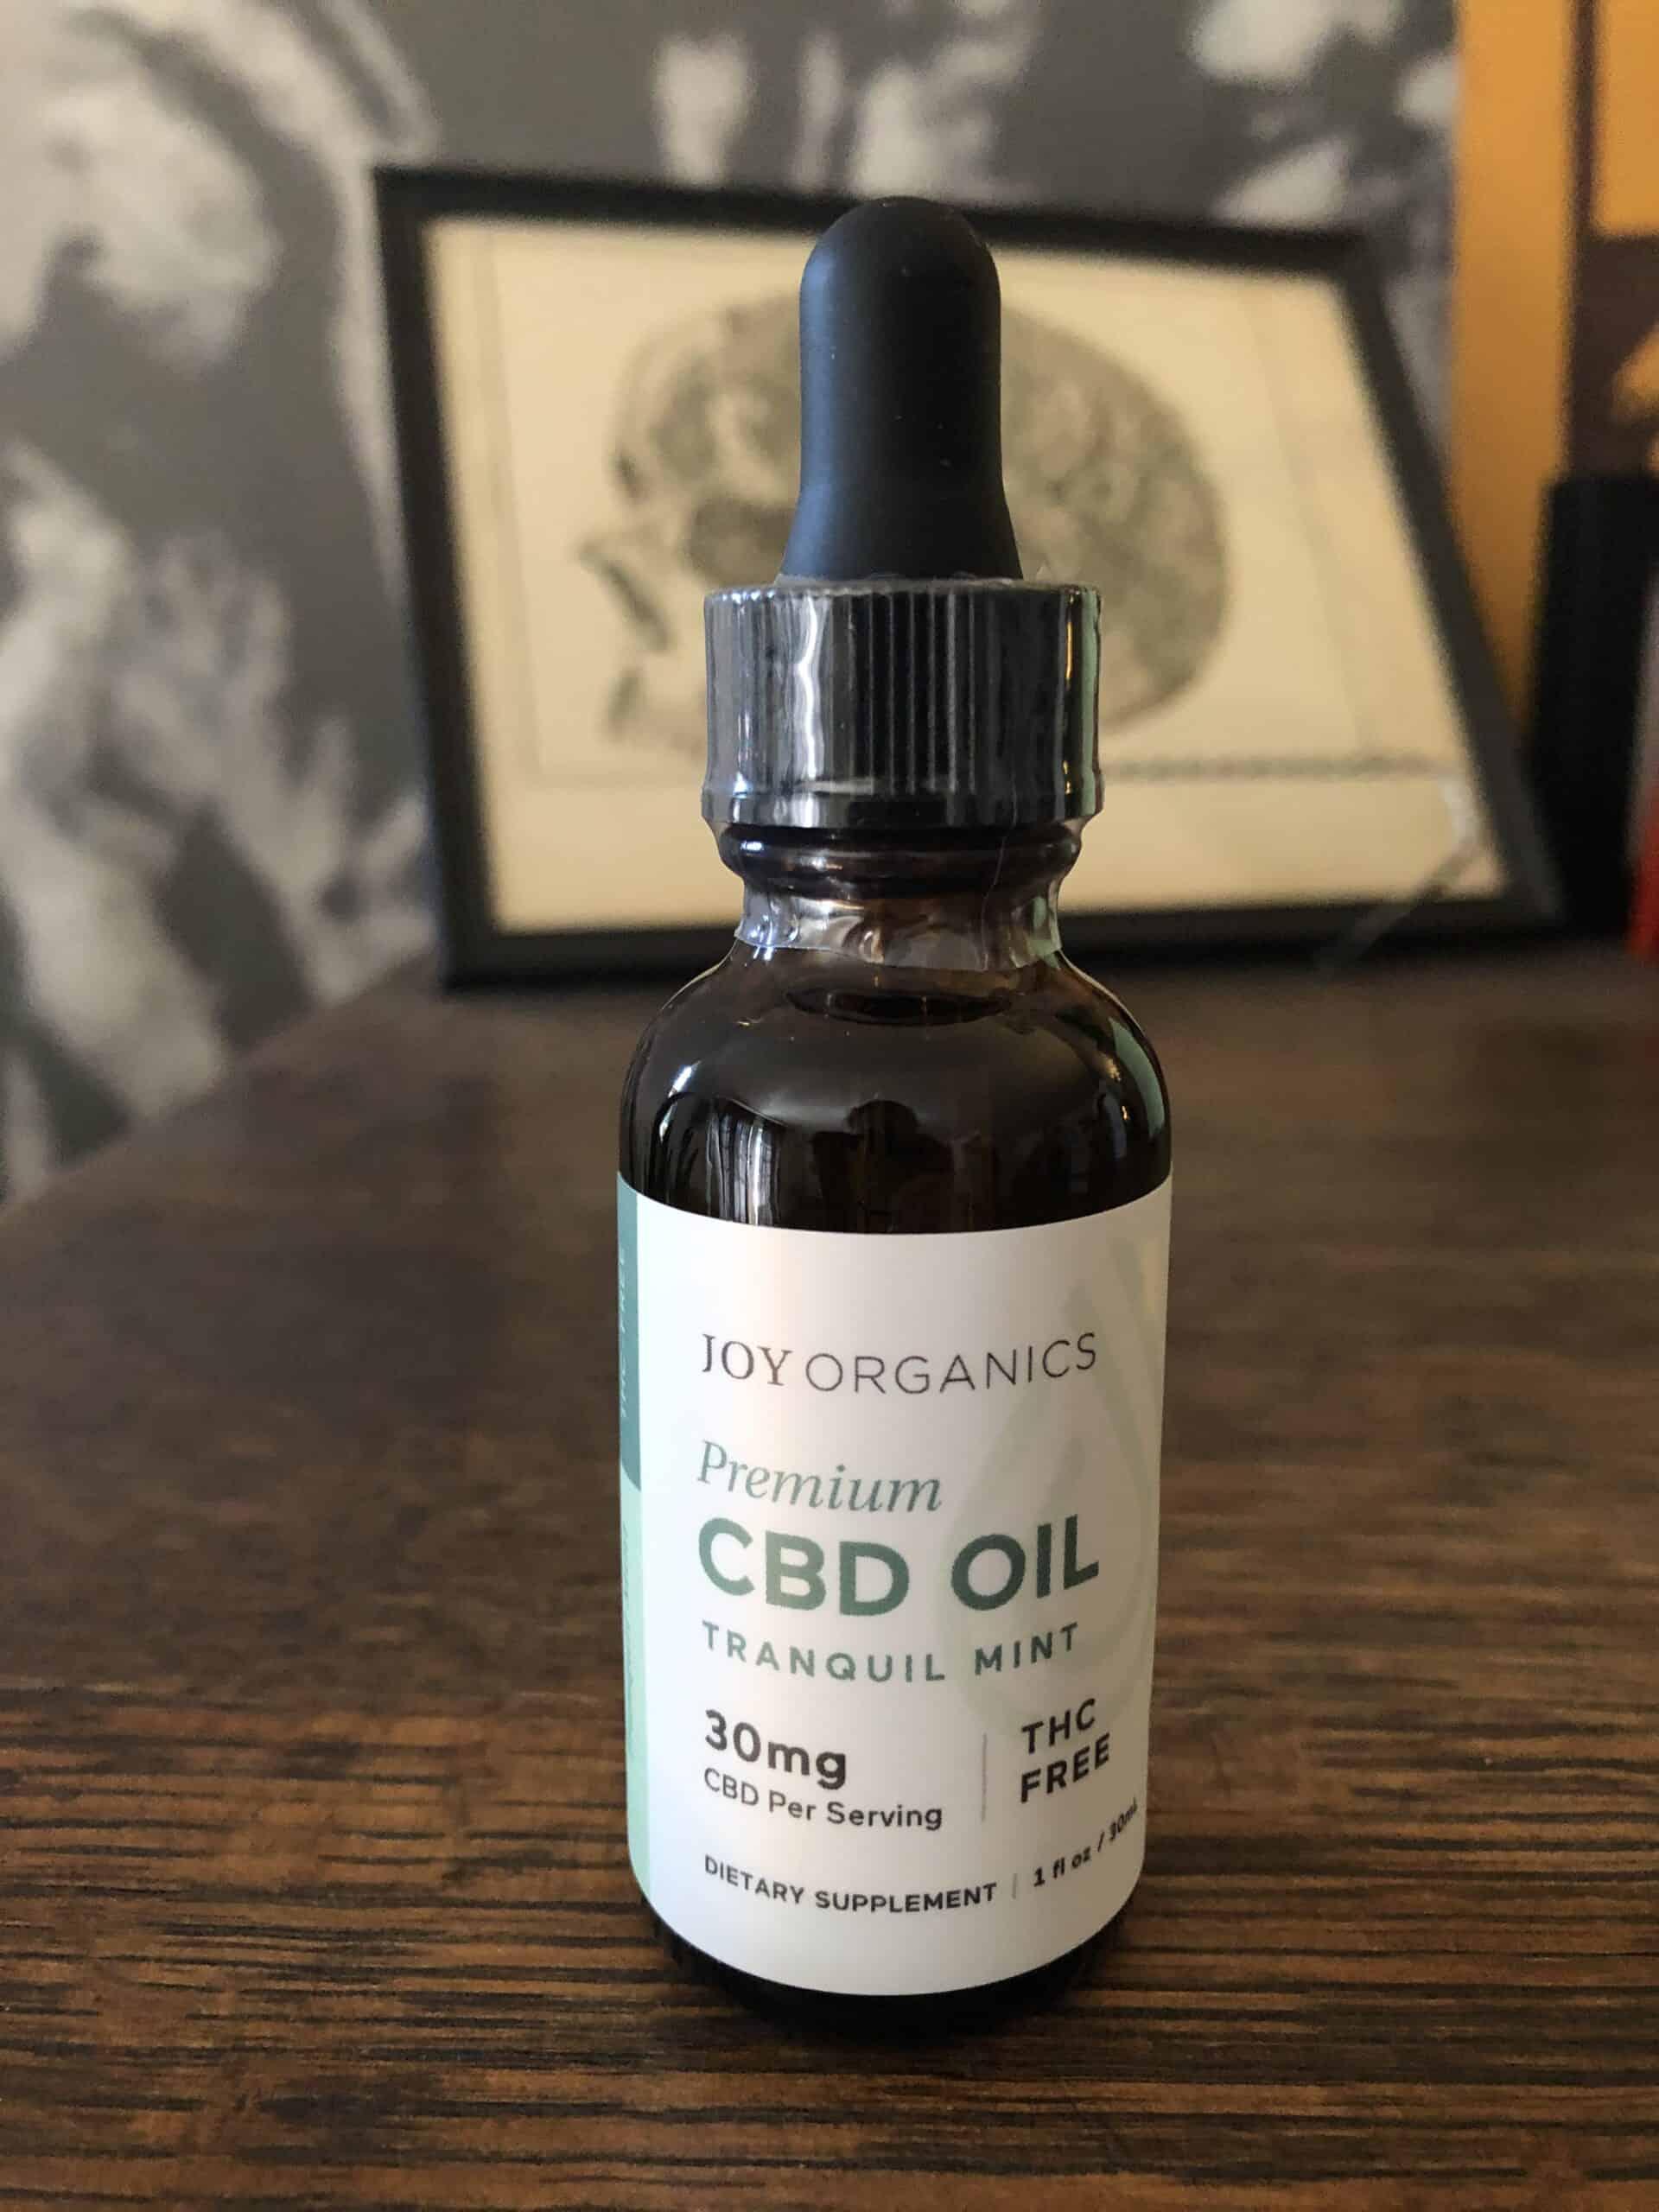 joy organics cbd oil tranquil mint 30 mg save on cannabis beauty shot